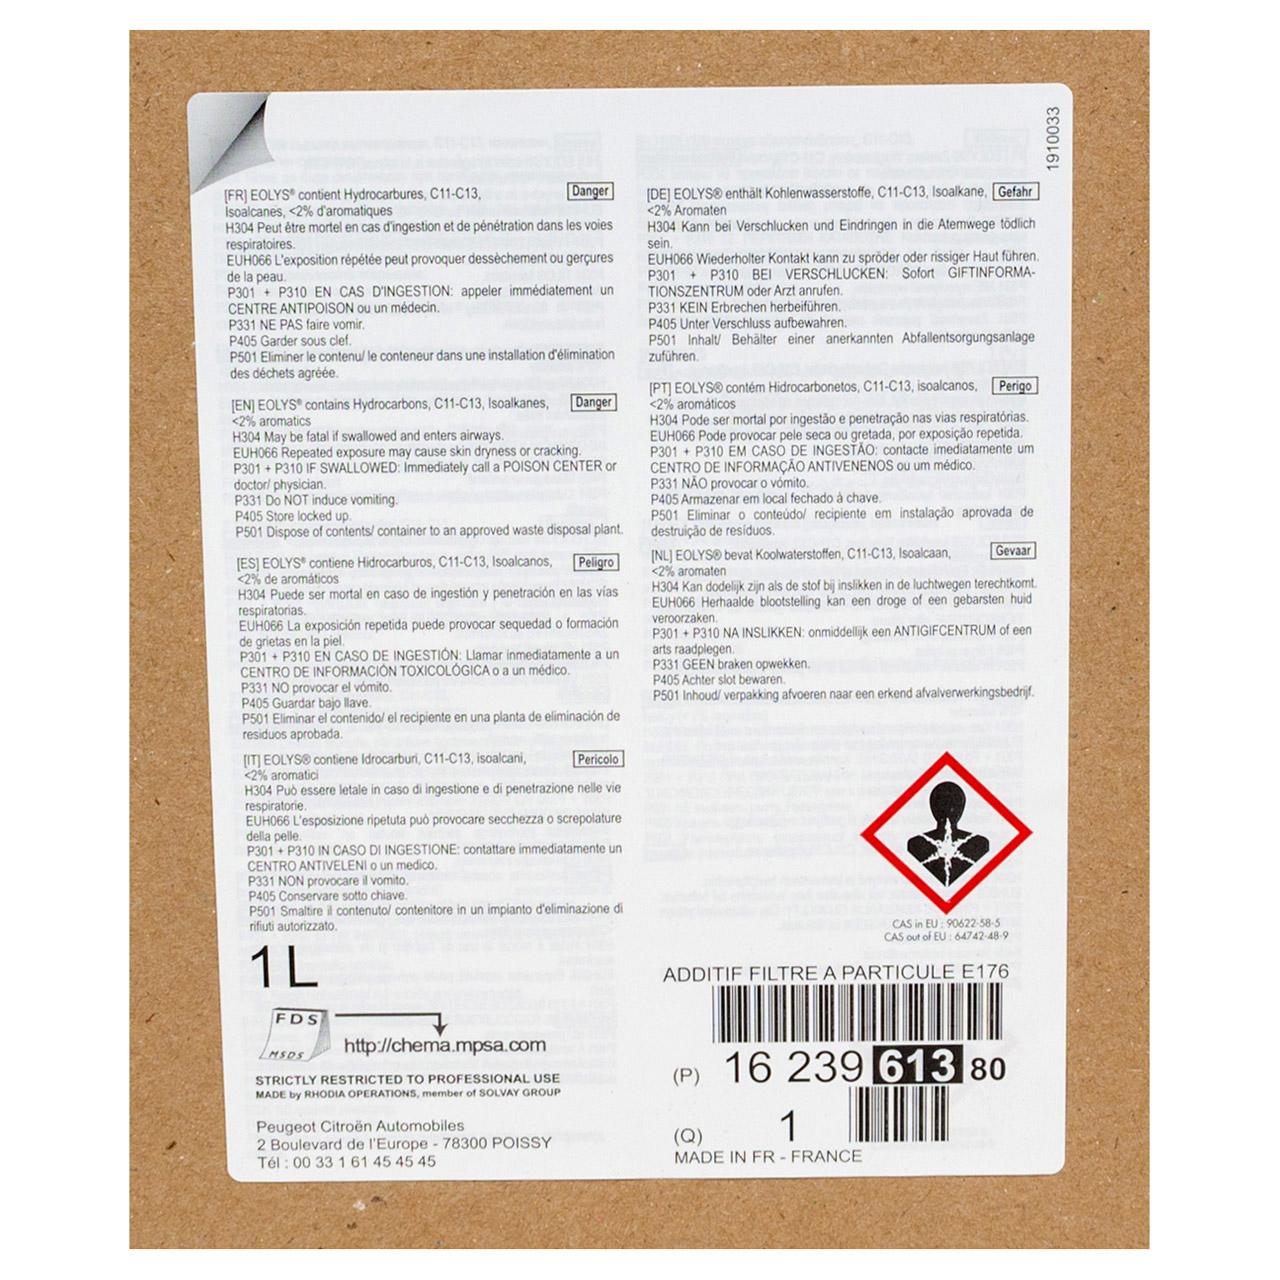 ORIGINAL Citroen Peugeot Kraftstoffadditiv Additiv Eolys 176 1000ml 1623961380